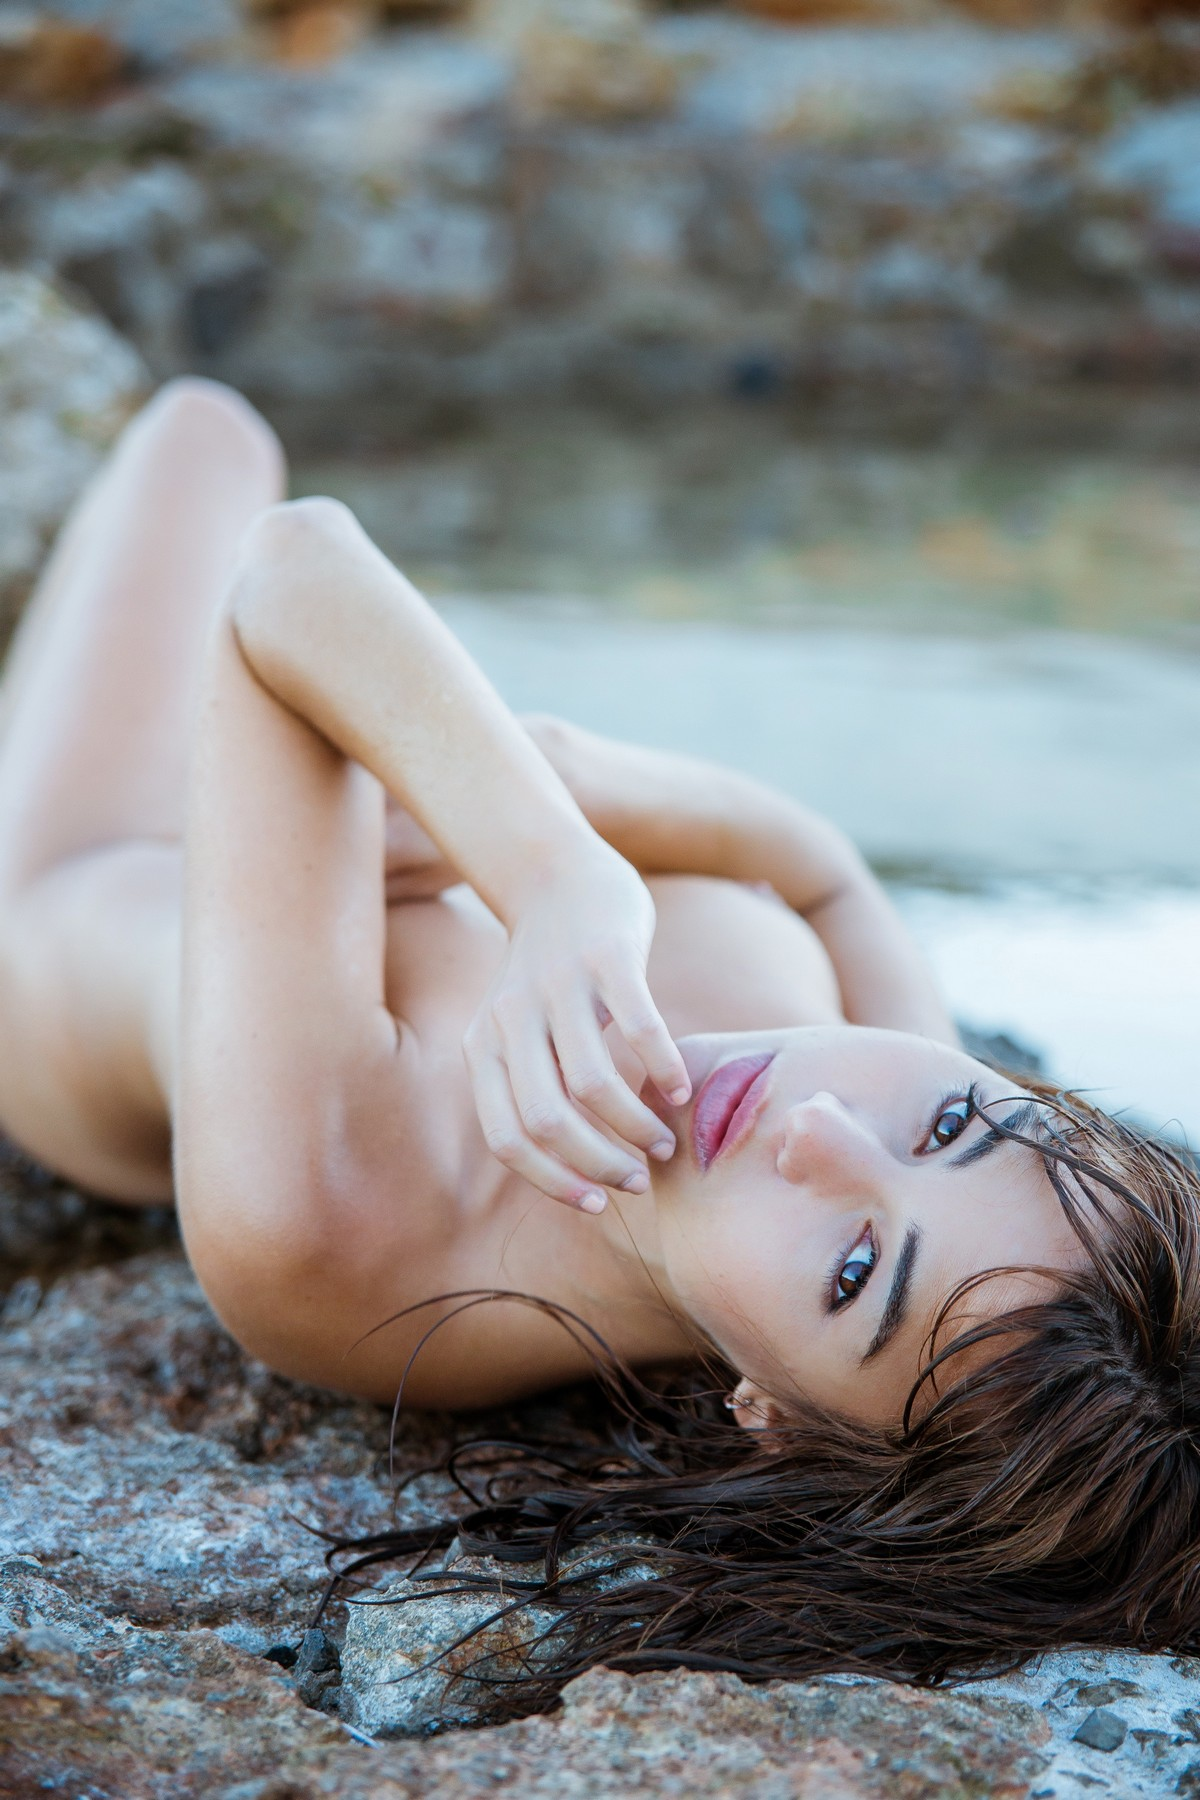 Обнаженная натура на снимках Розы Сципион